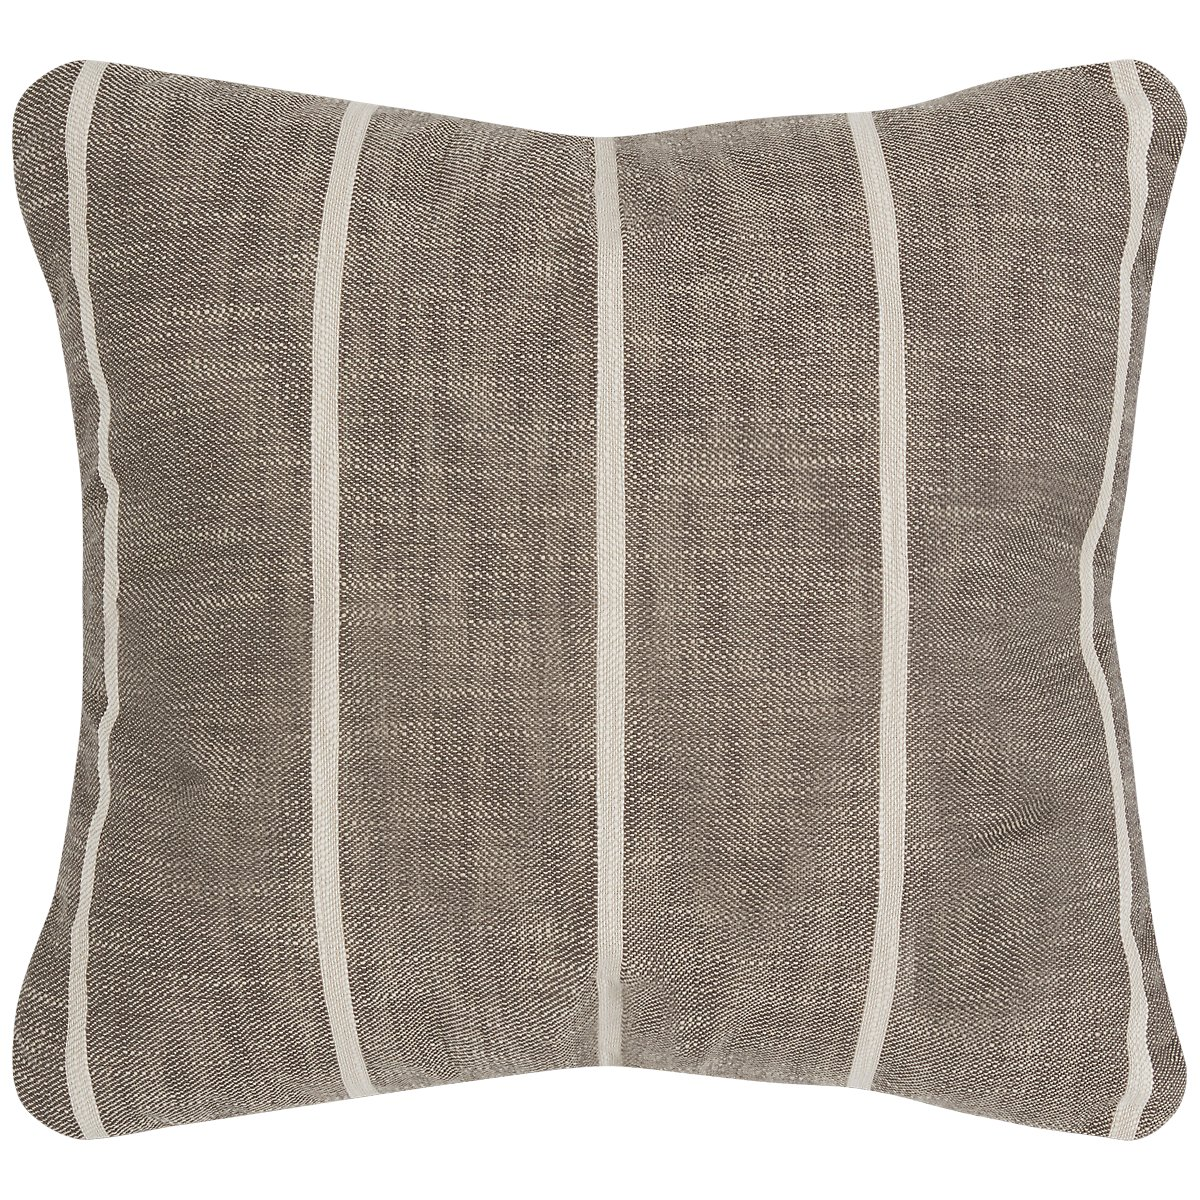 Bellevue Gray Stripe Square Accent Pillow